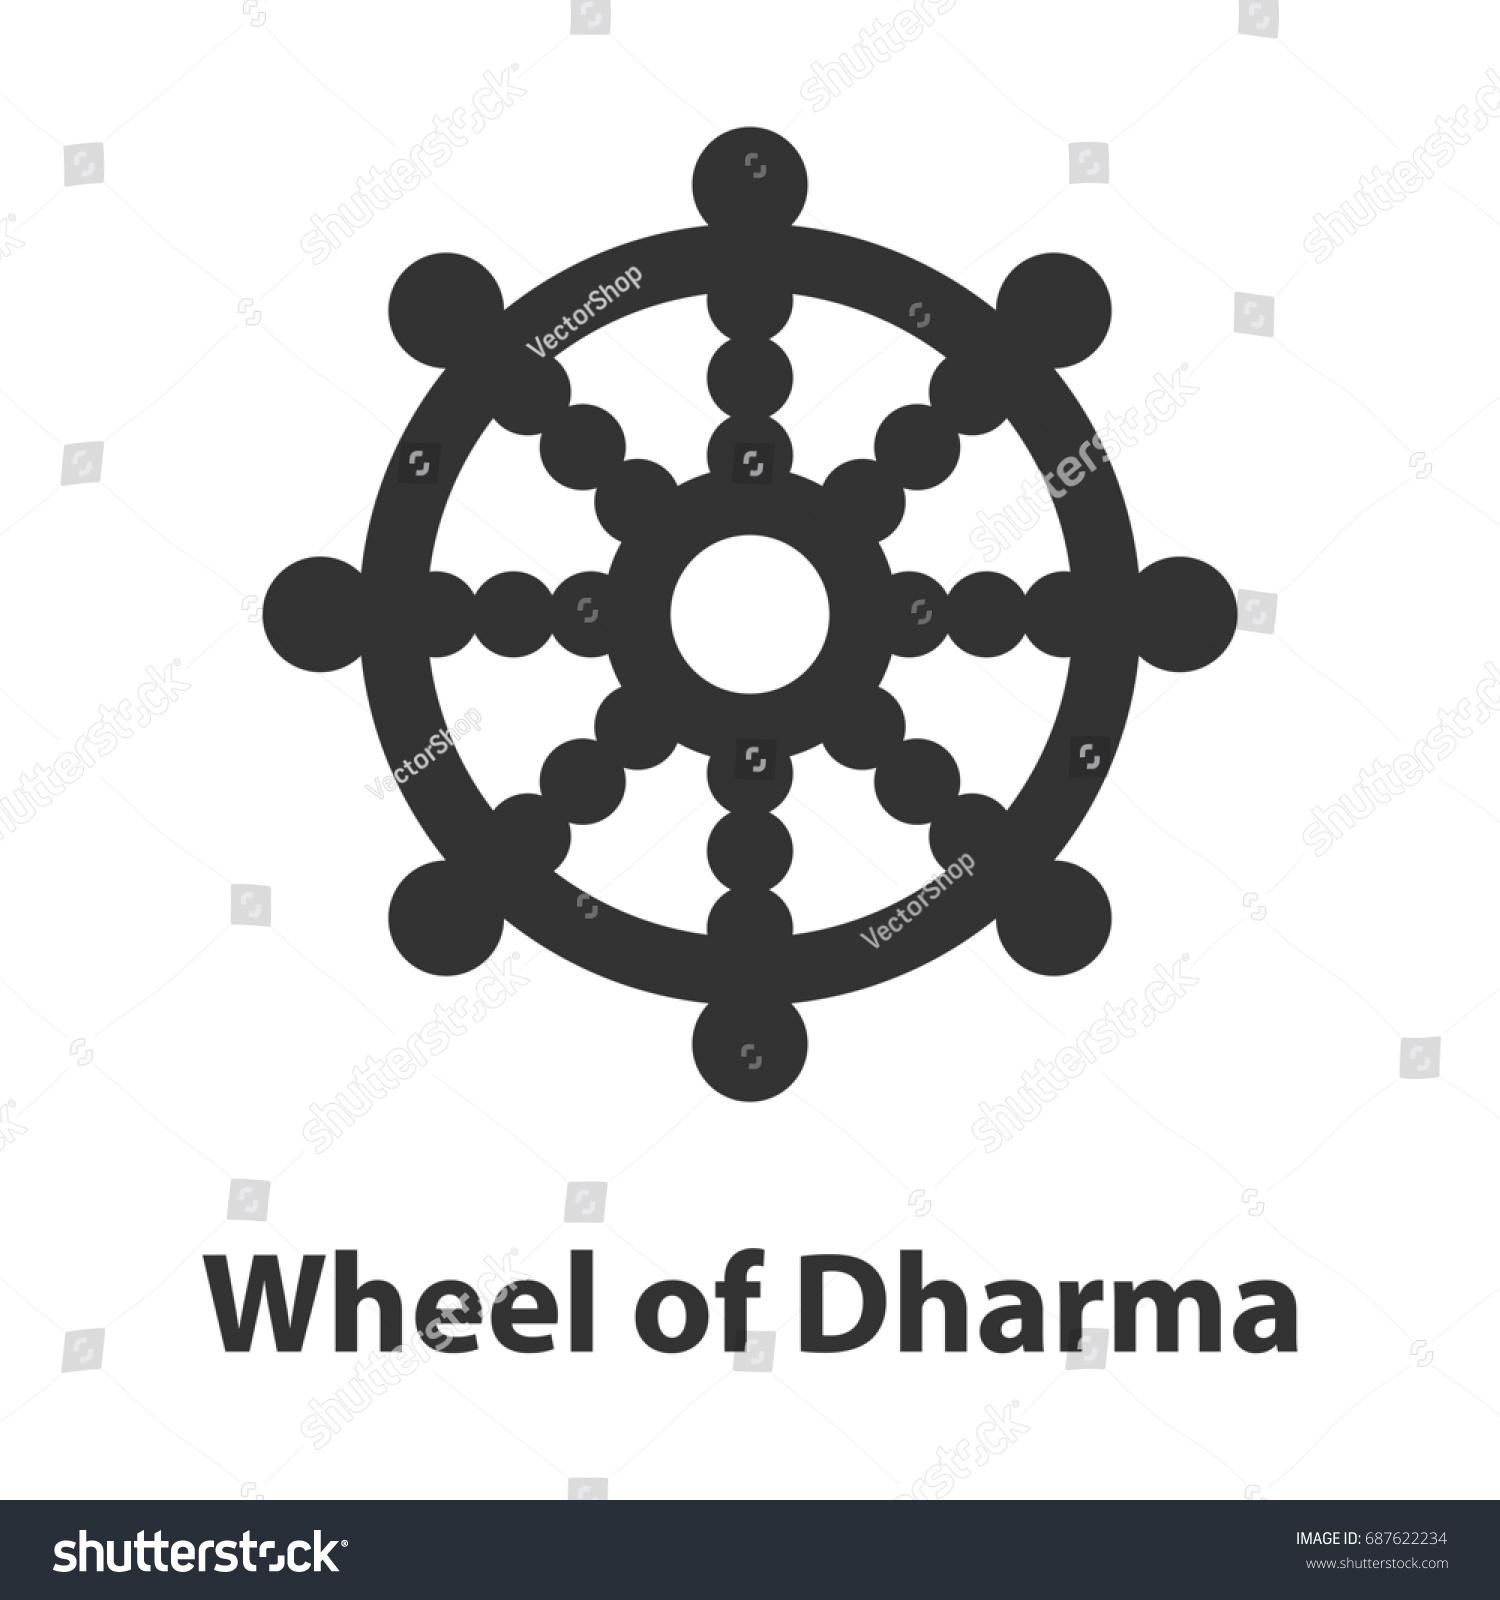 Icon Of Wheel Of Dharma Symbol Buddhism Religion Sign Ez Canvas